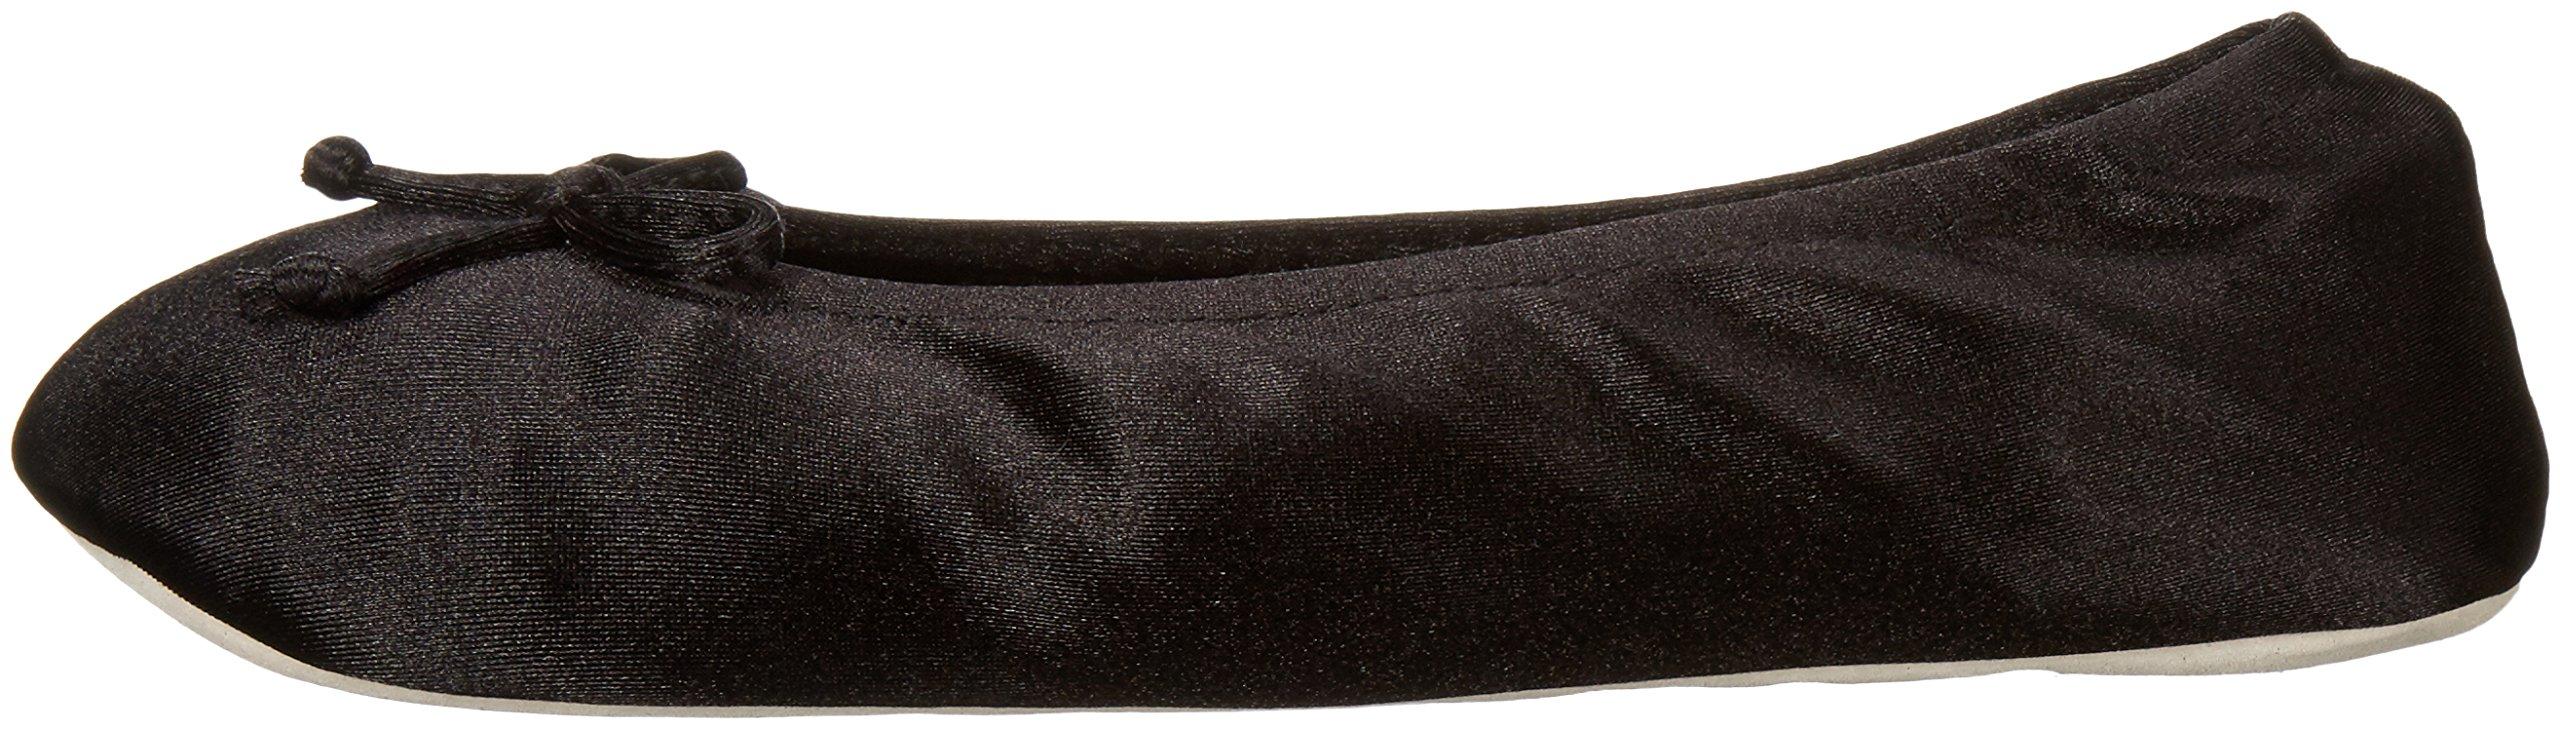 ISOTONER Women's Satin Ballerina Slipper, Black, Large/8-9 M US by ISOTONER (Image #5)